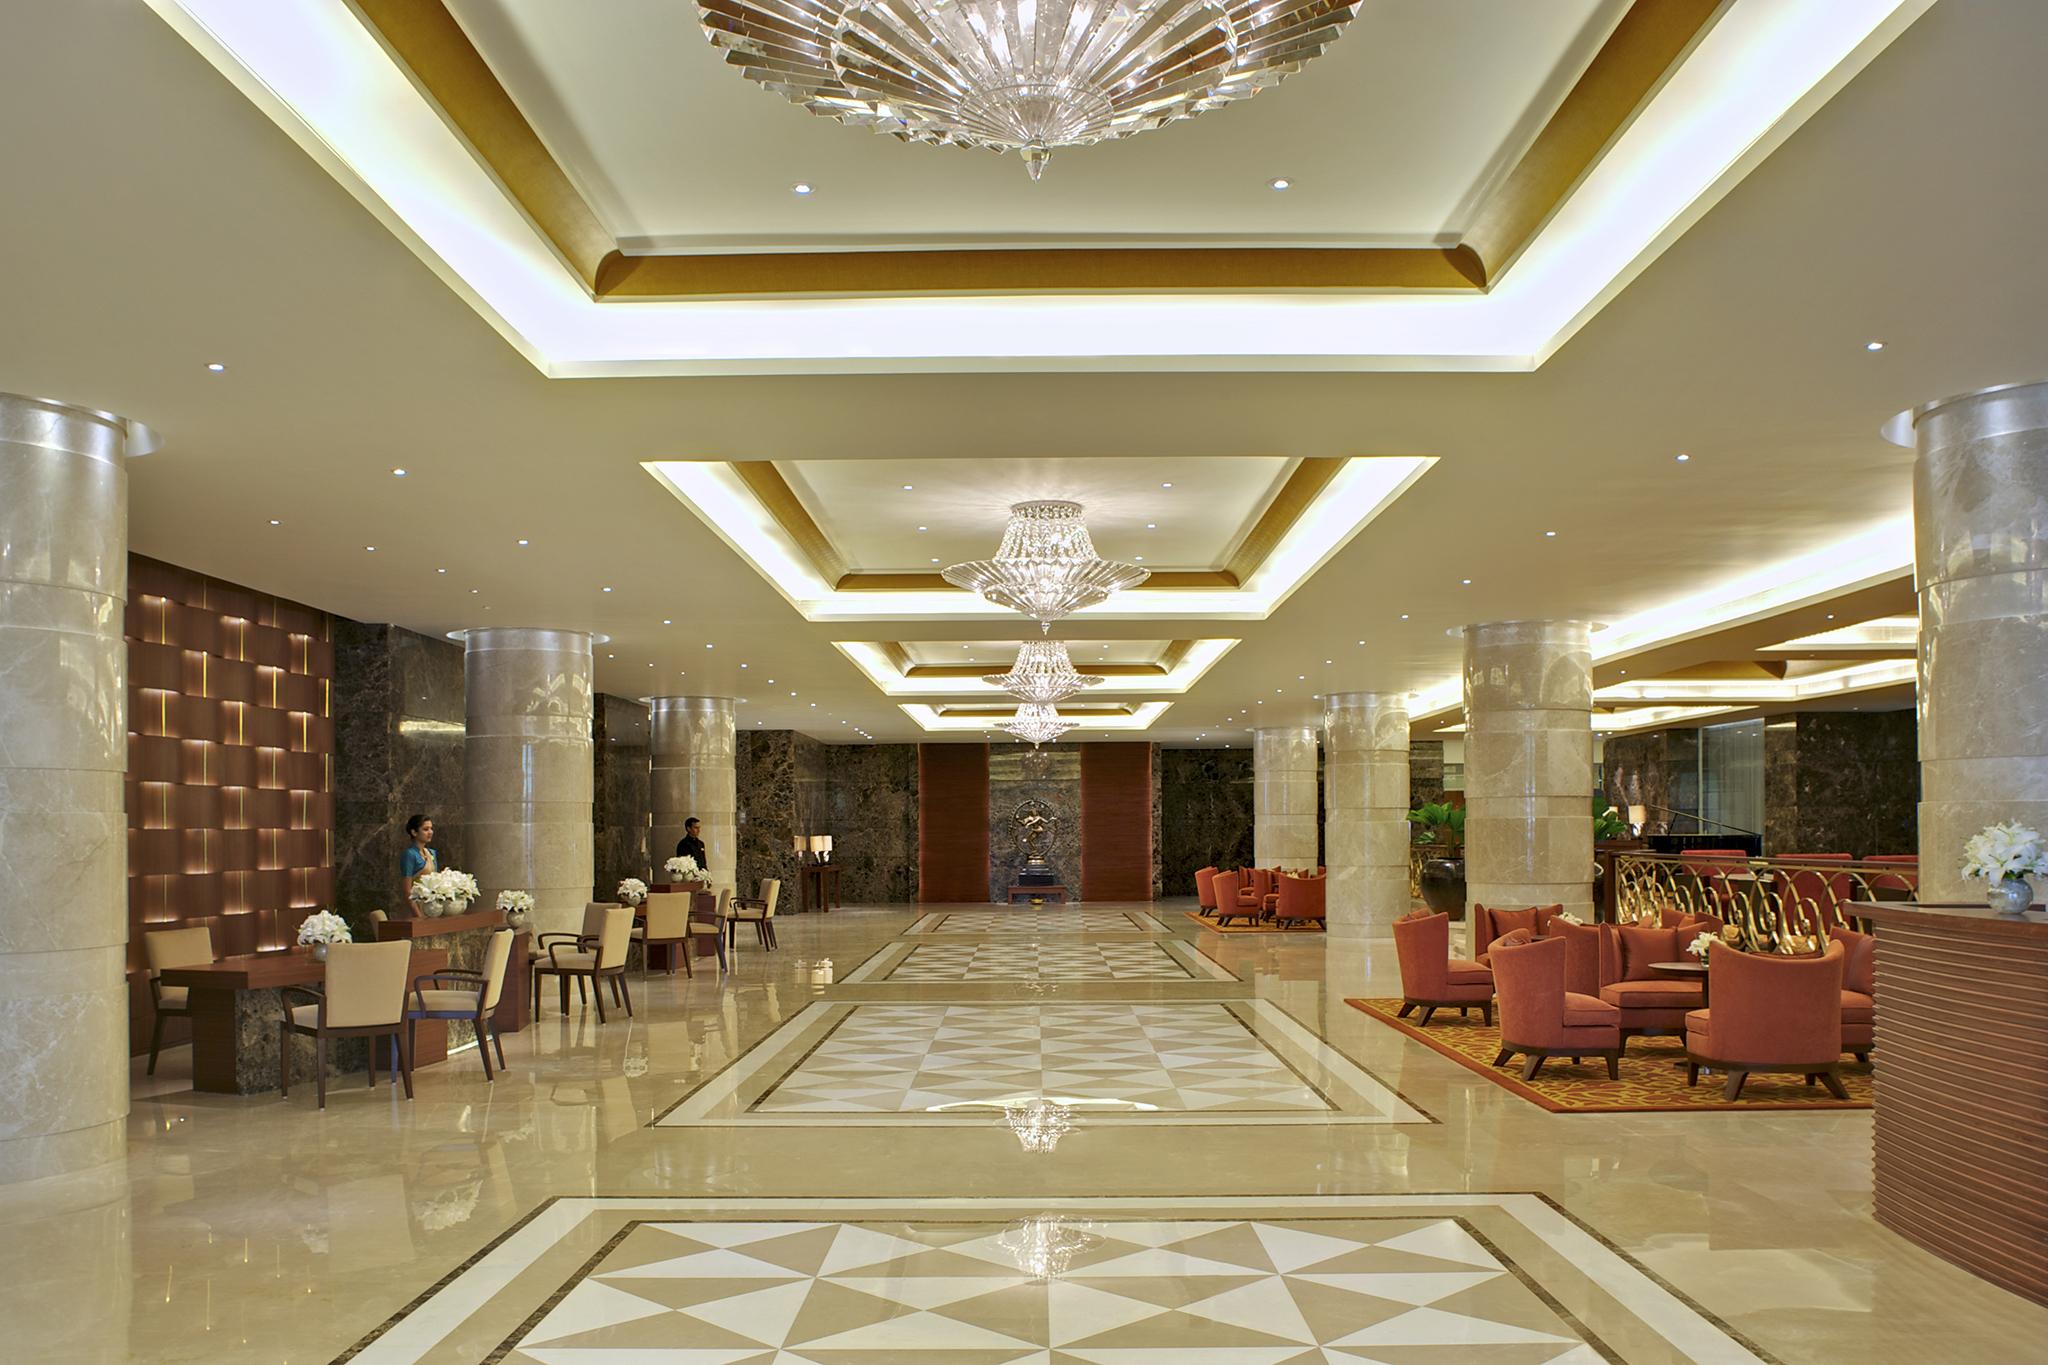 Lobby at Taj Coromandel